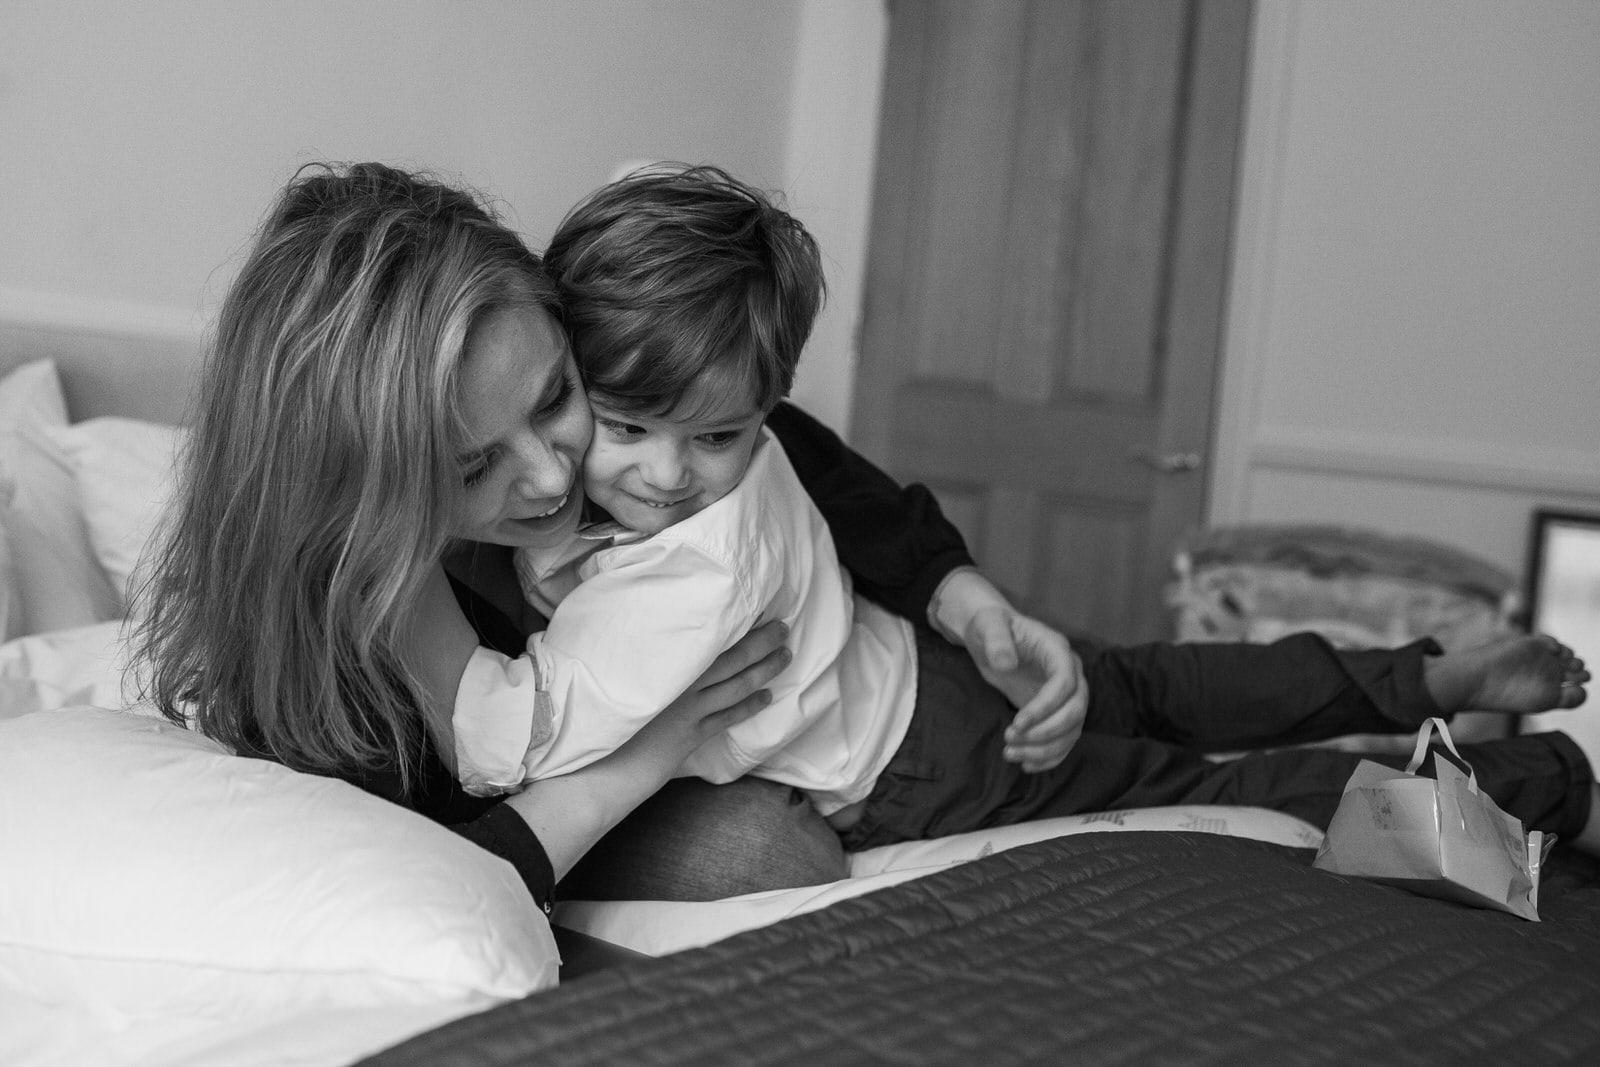 kensington-day-in-the-life-documentary-family-photographs-0025